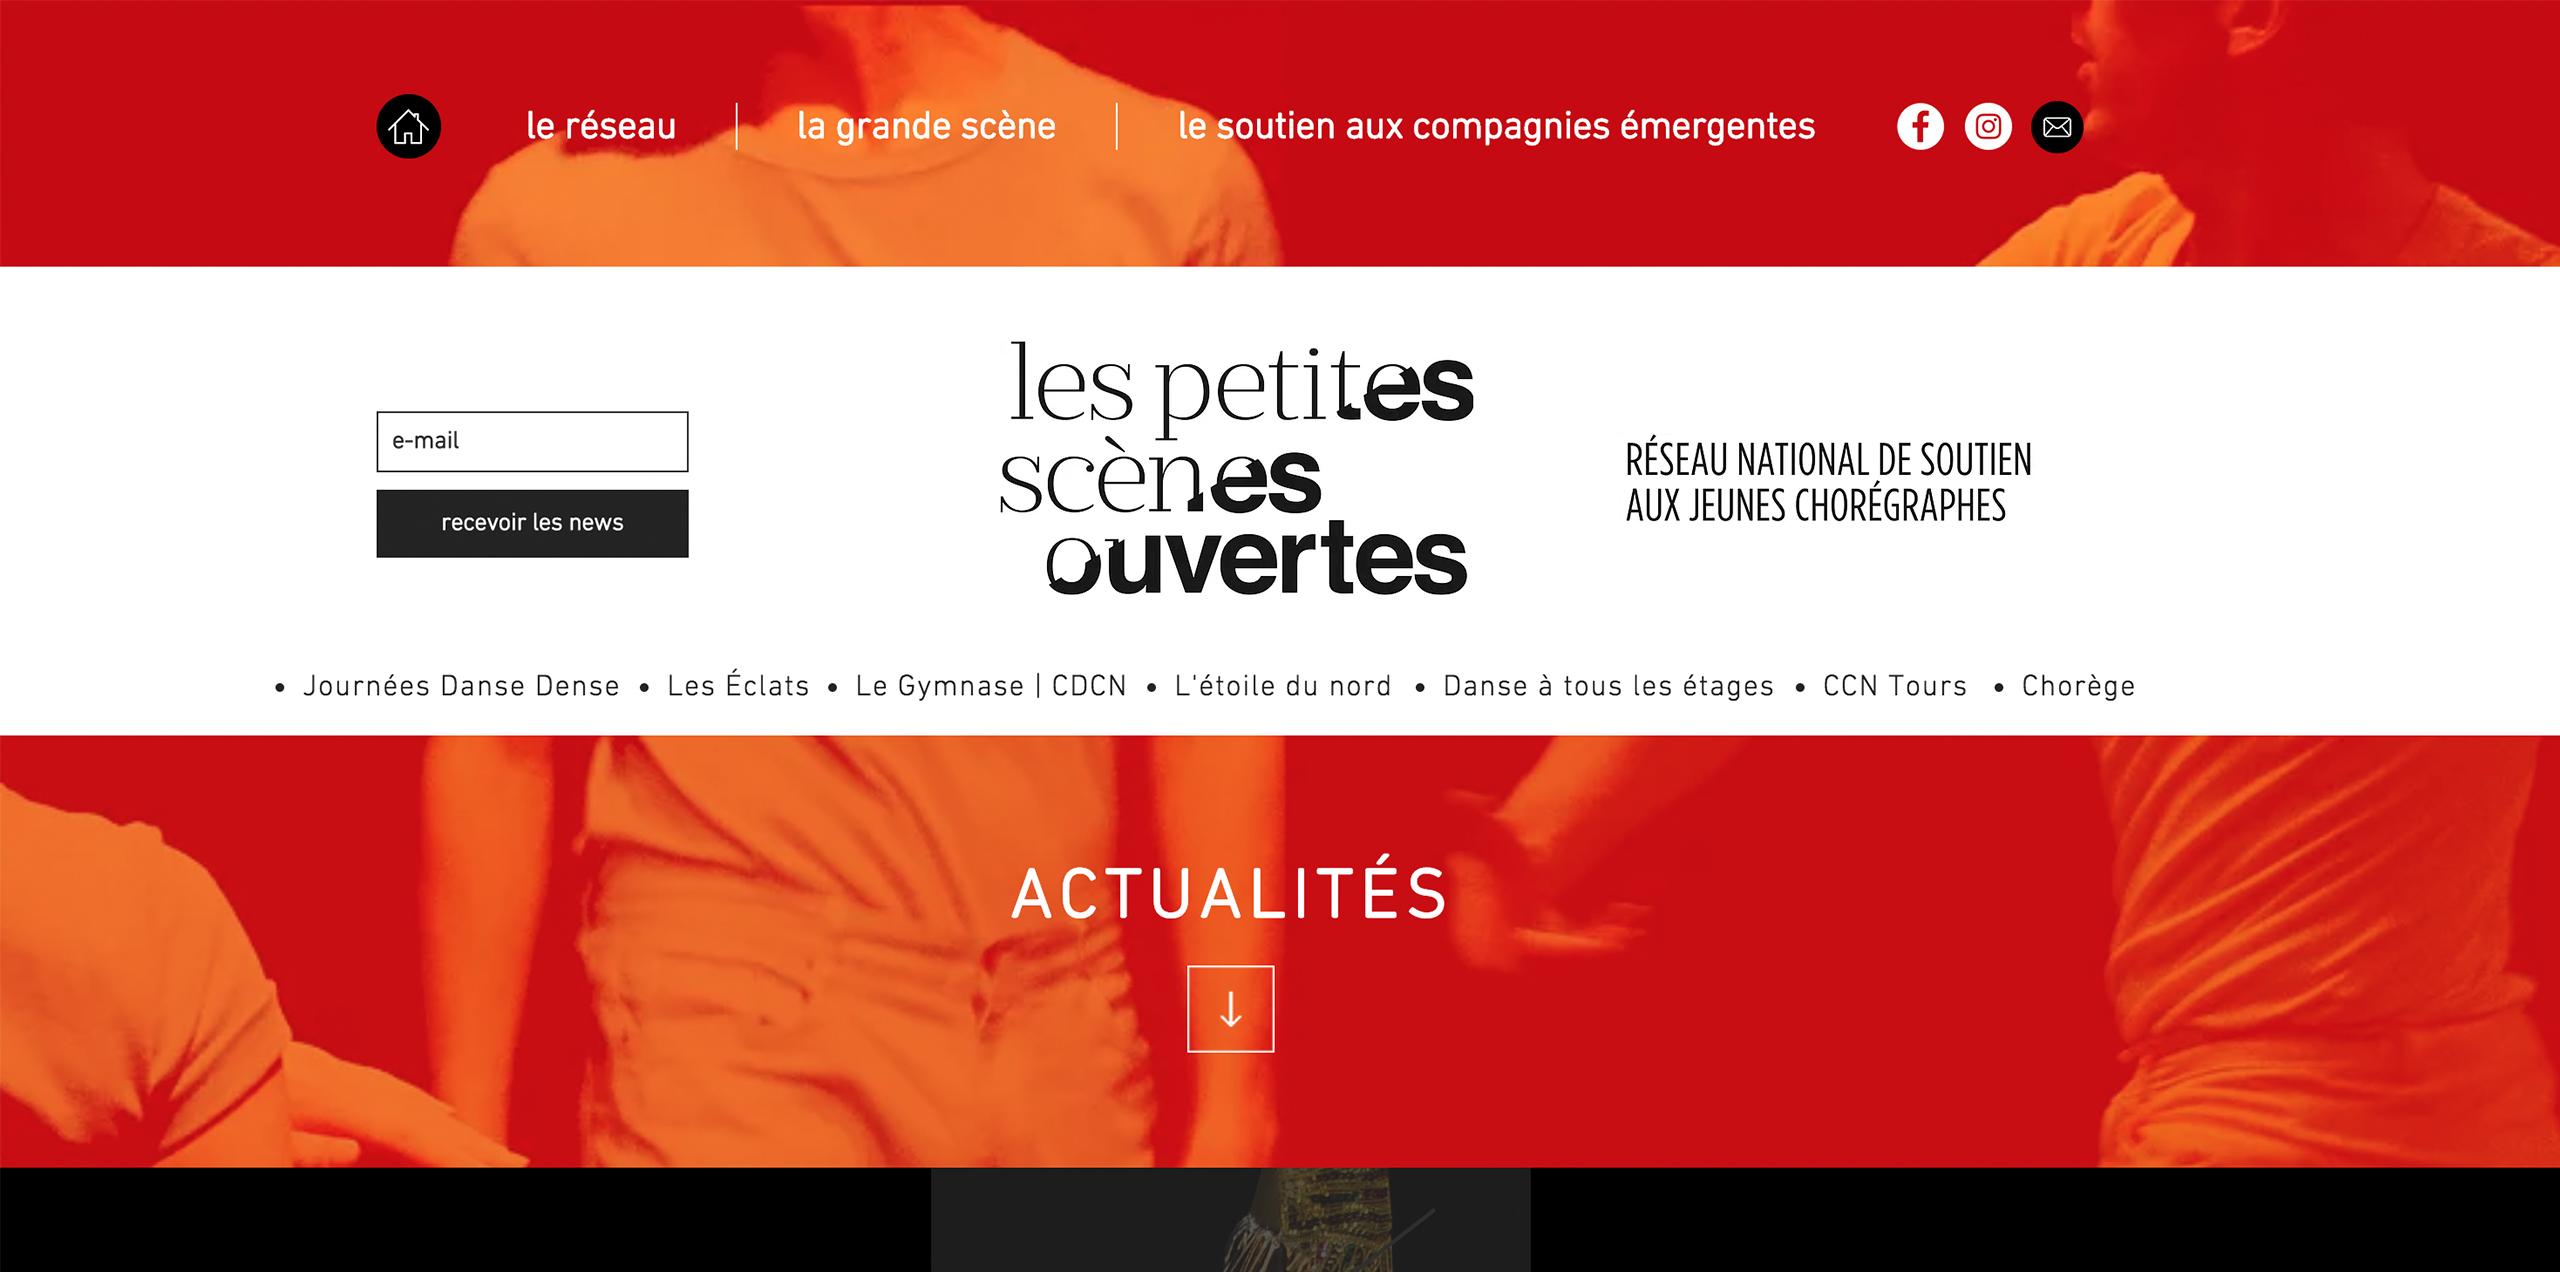 www.petites-scenes-ouvertes.f